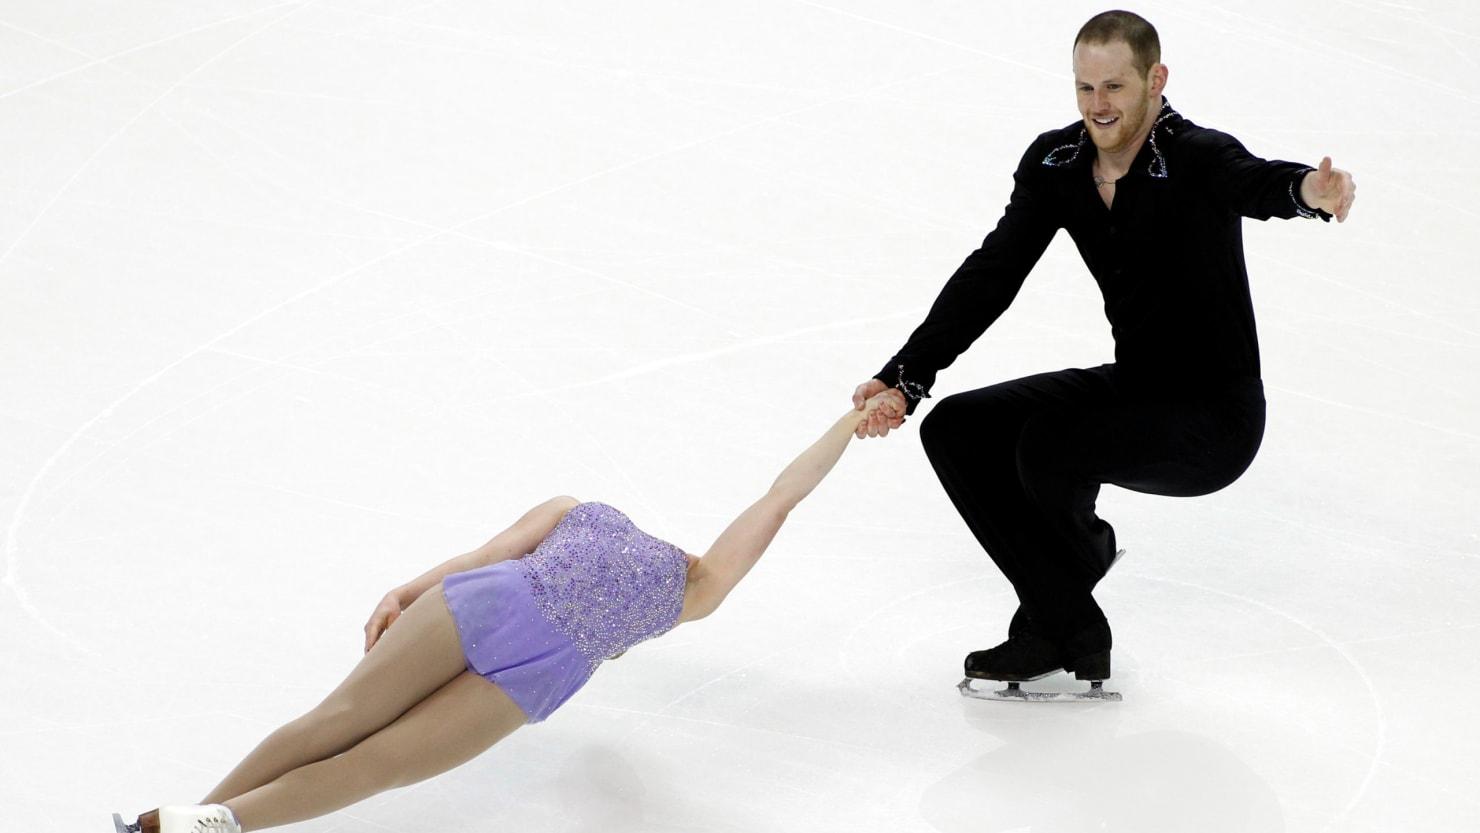 Former US Figure Skating Champion John Coughlin Commits